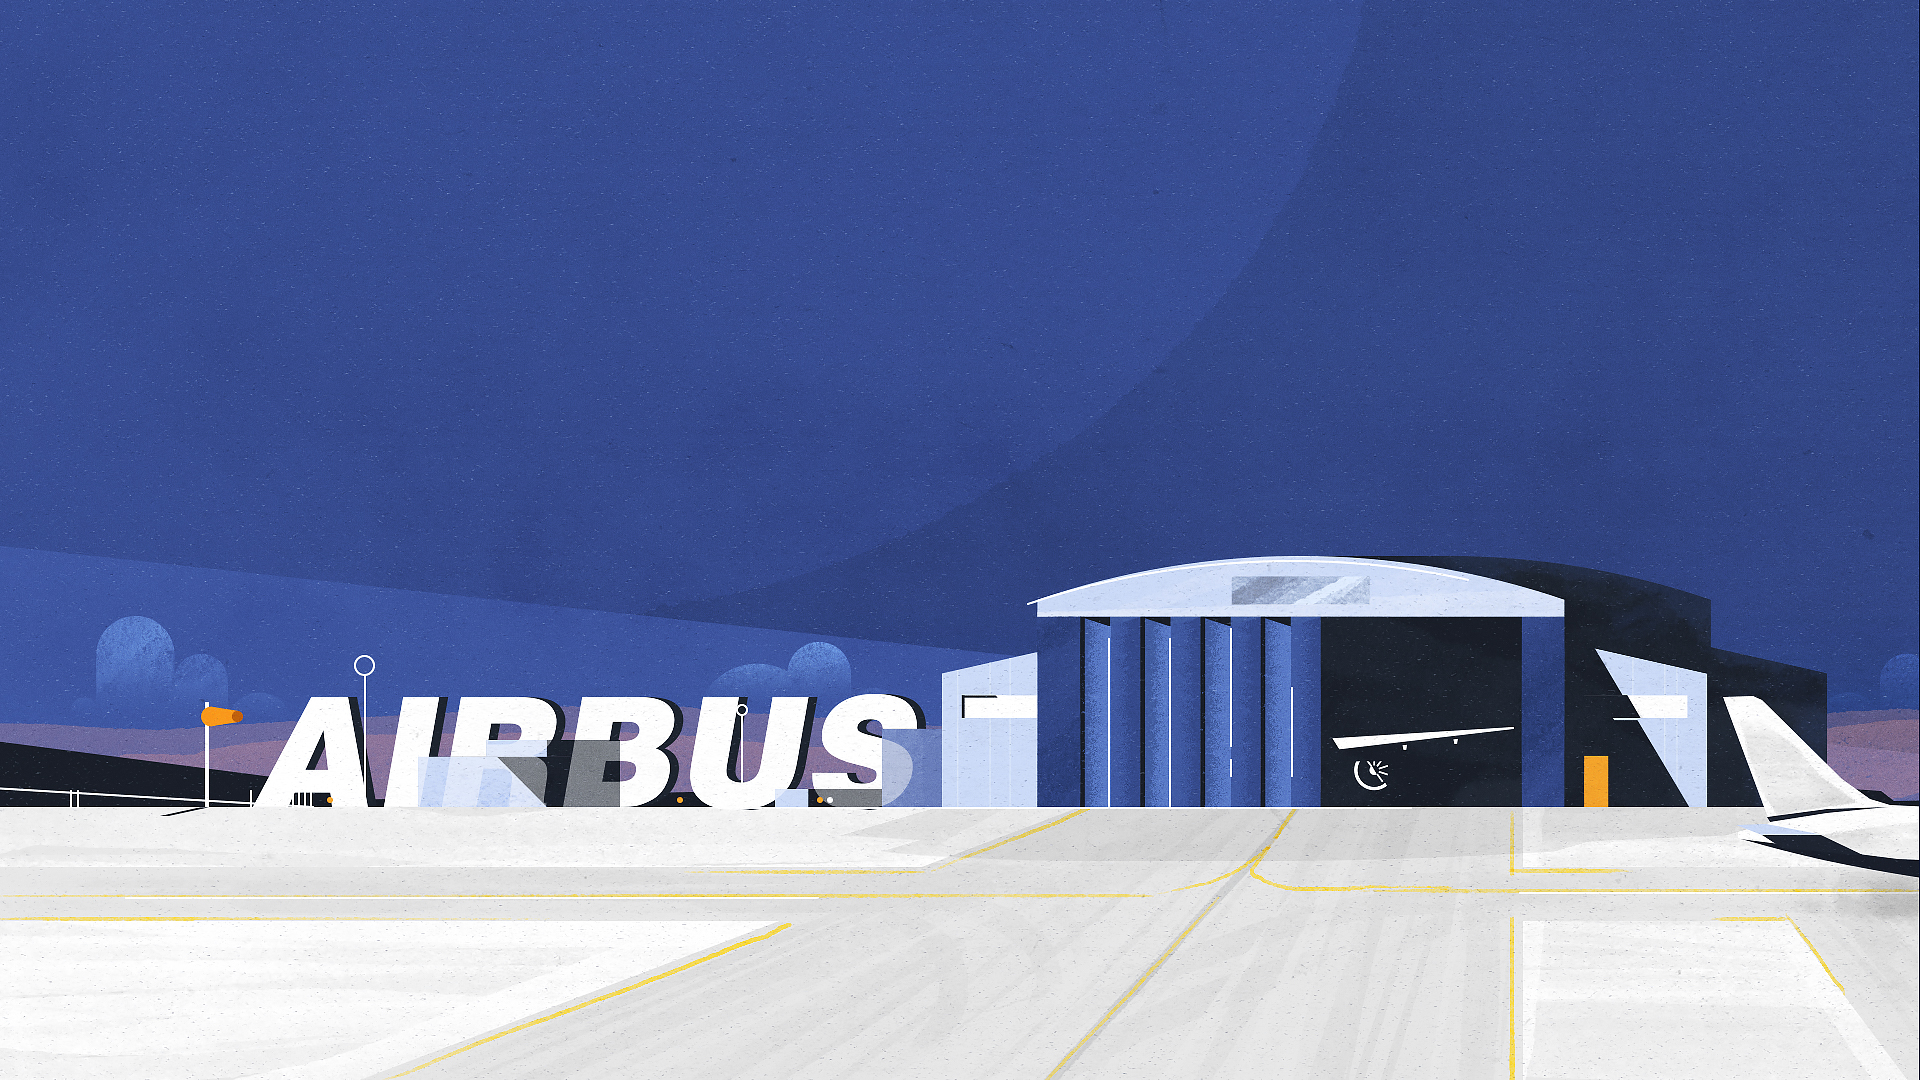 airbus-research-01.jpg